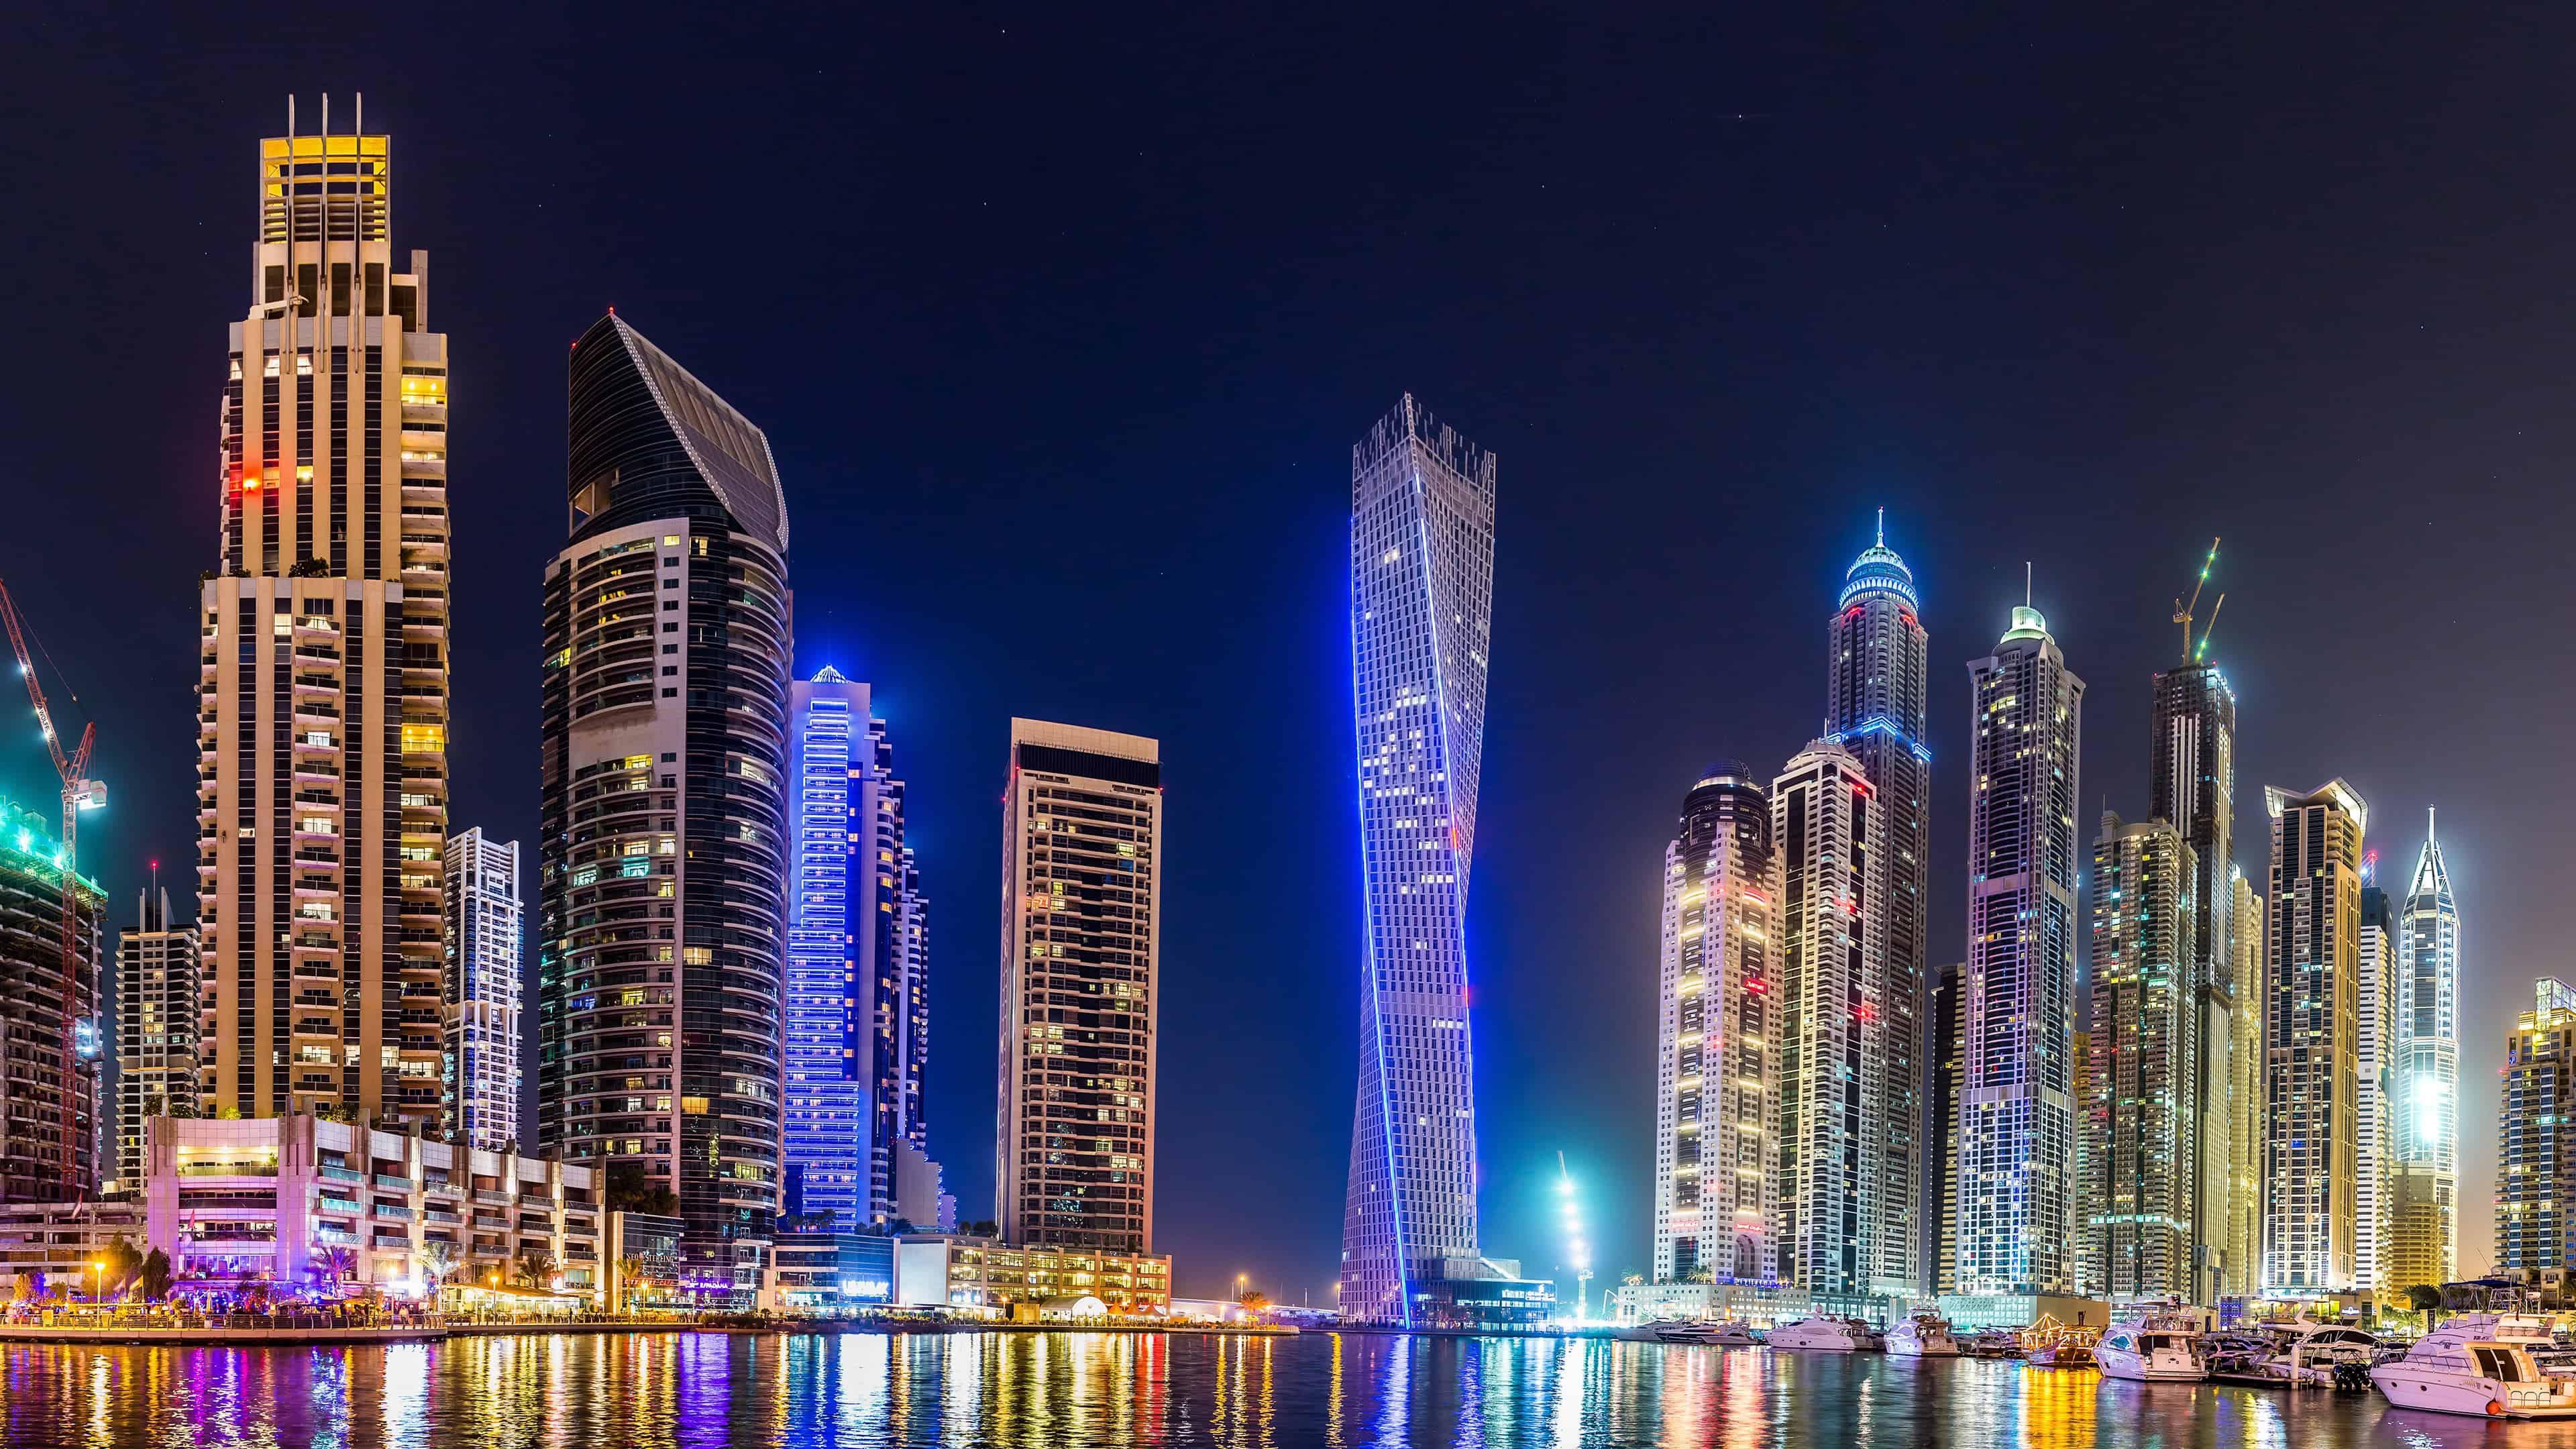 New Cars Games >> Dubai Skyline At Night UHD 4K Wallpaper | Pixelz